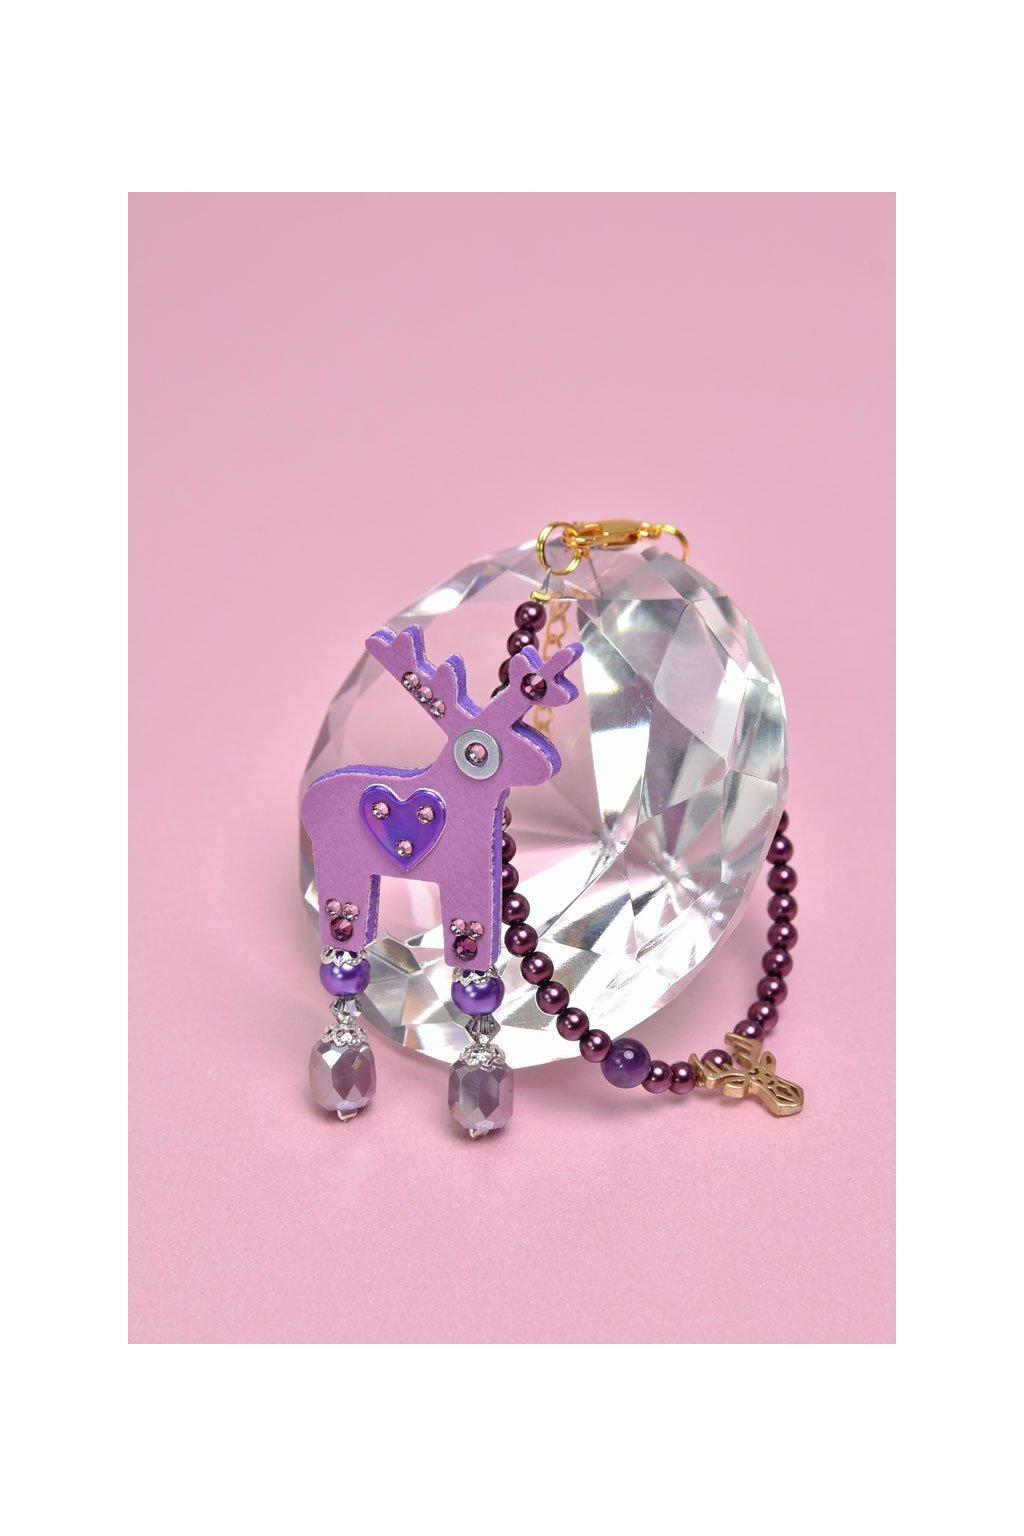 deers jeleni broz minibroz mistr bazalinek